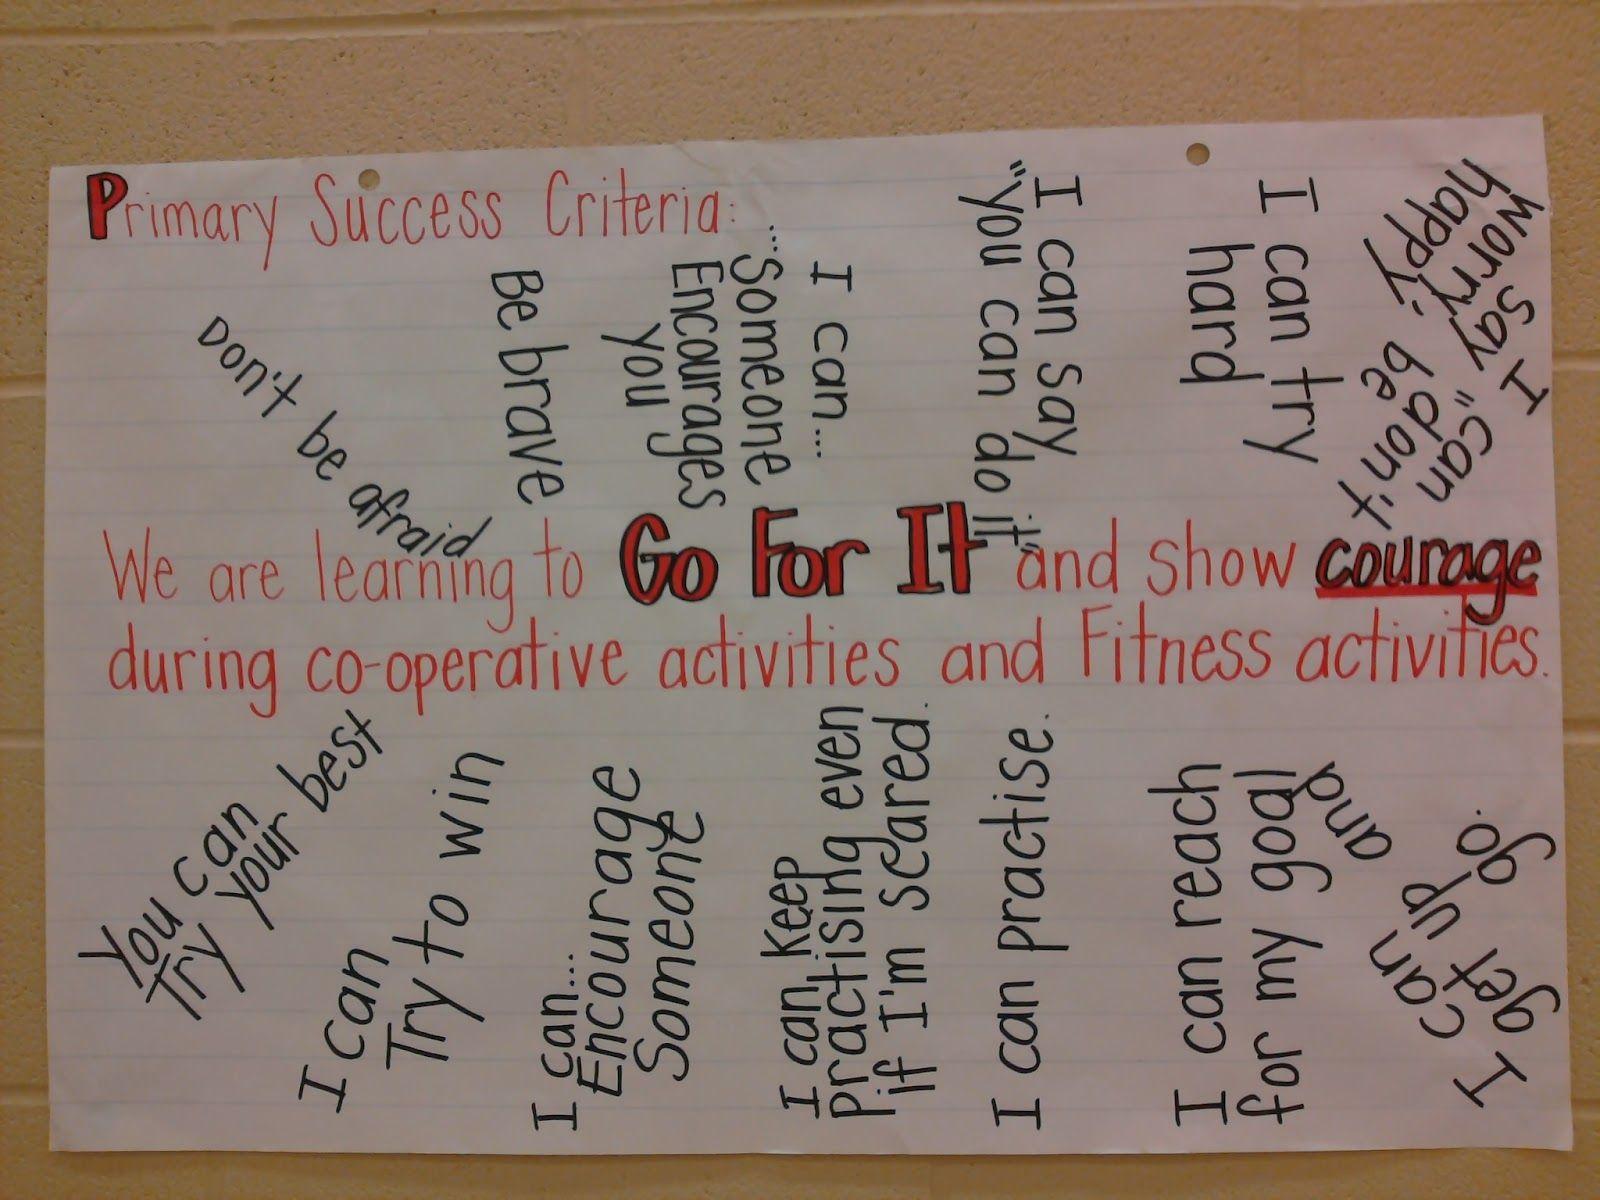 Minor updateeffective curriculum ideas preschool